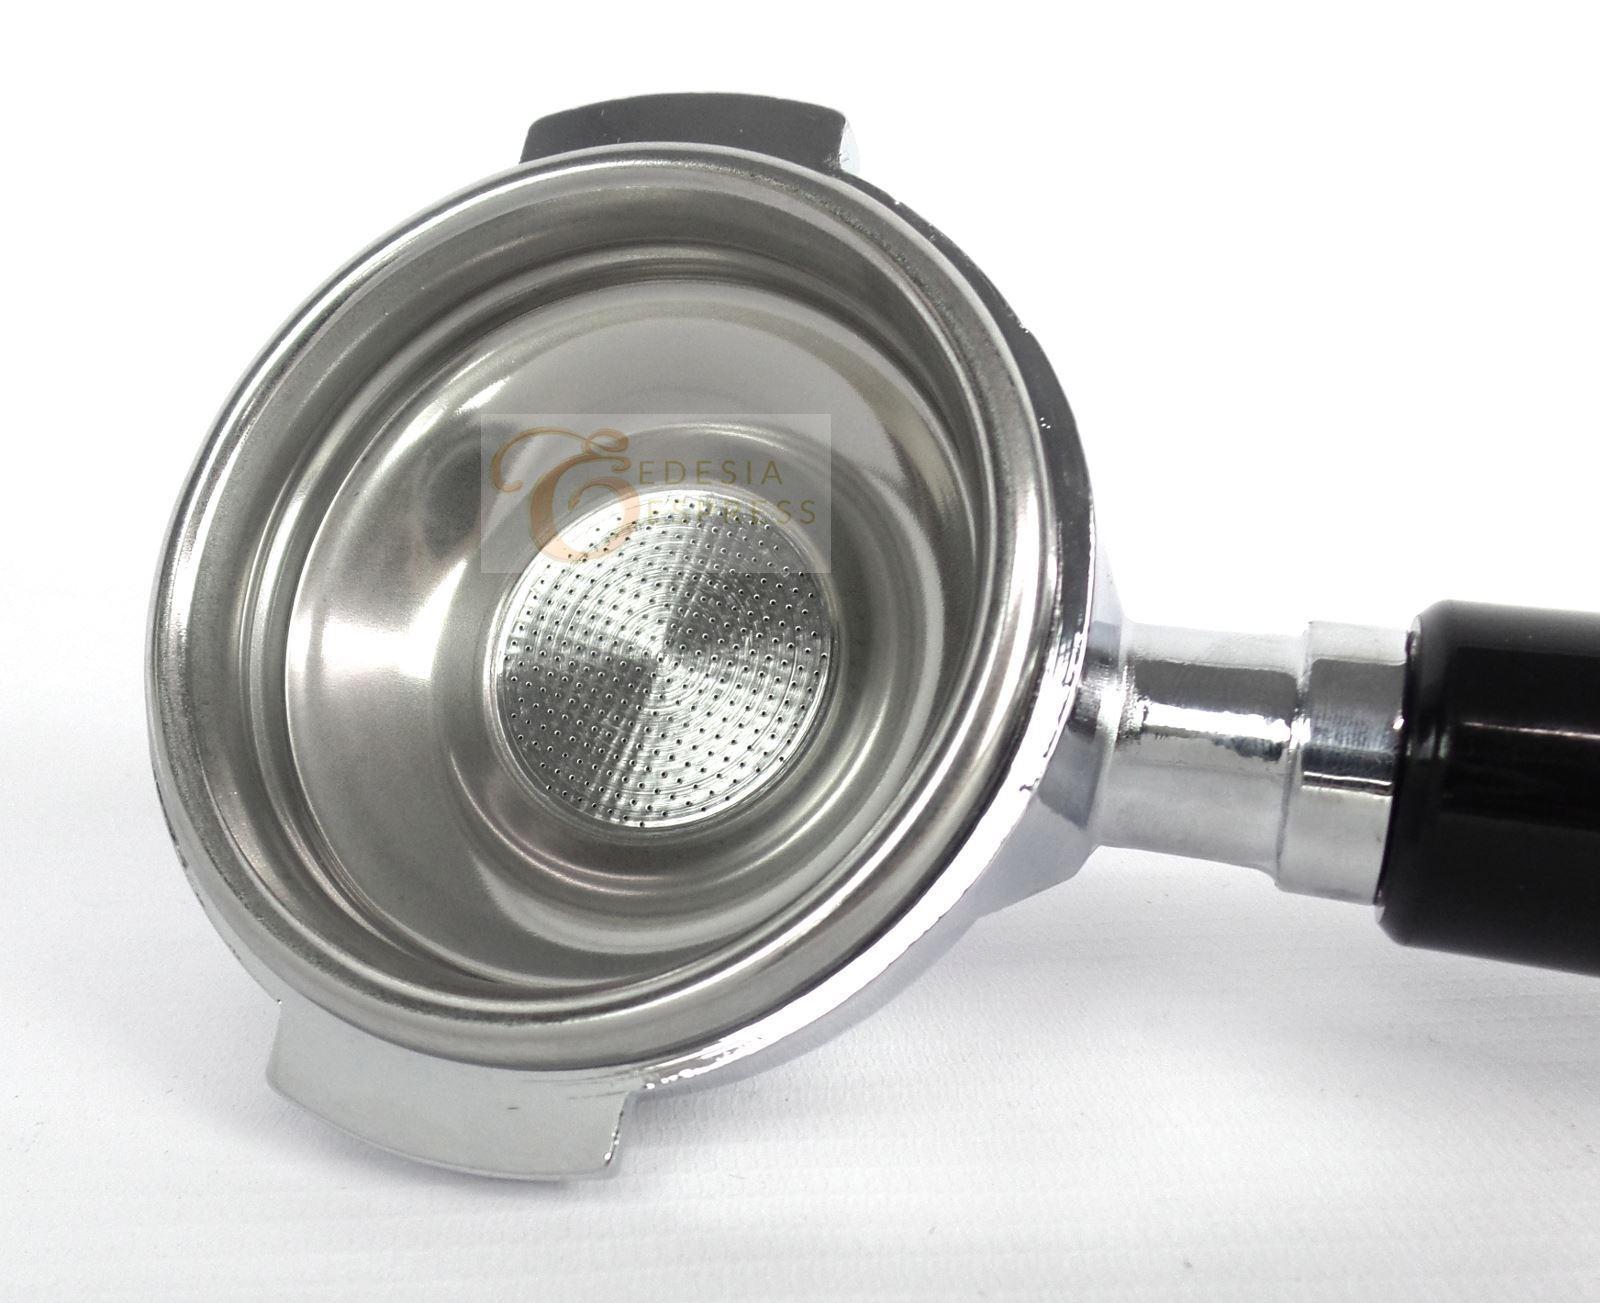 1 Spout ASTRA Portafilter Coffee Espresso Machine Group Handle 7g Basket